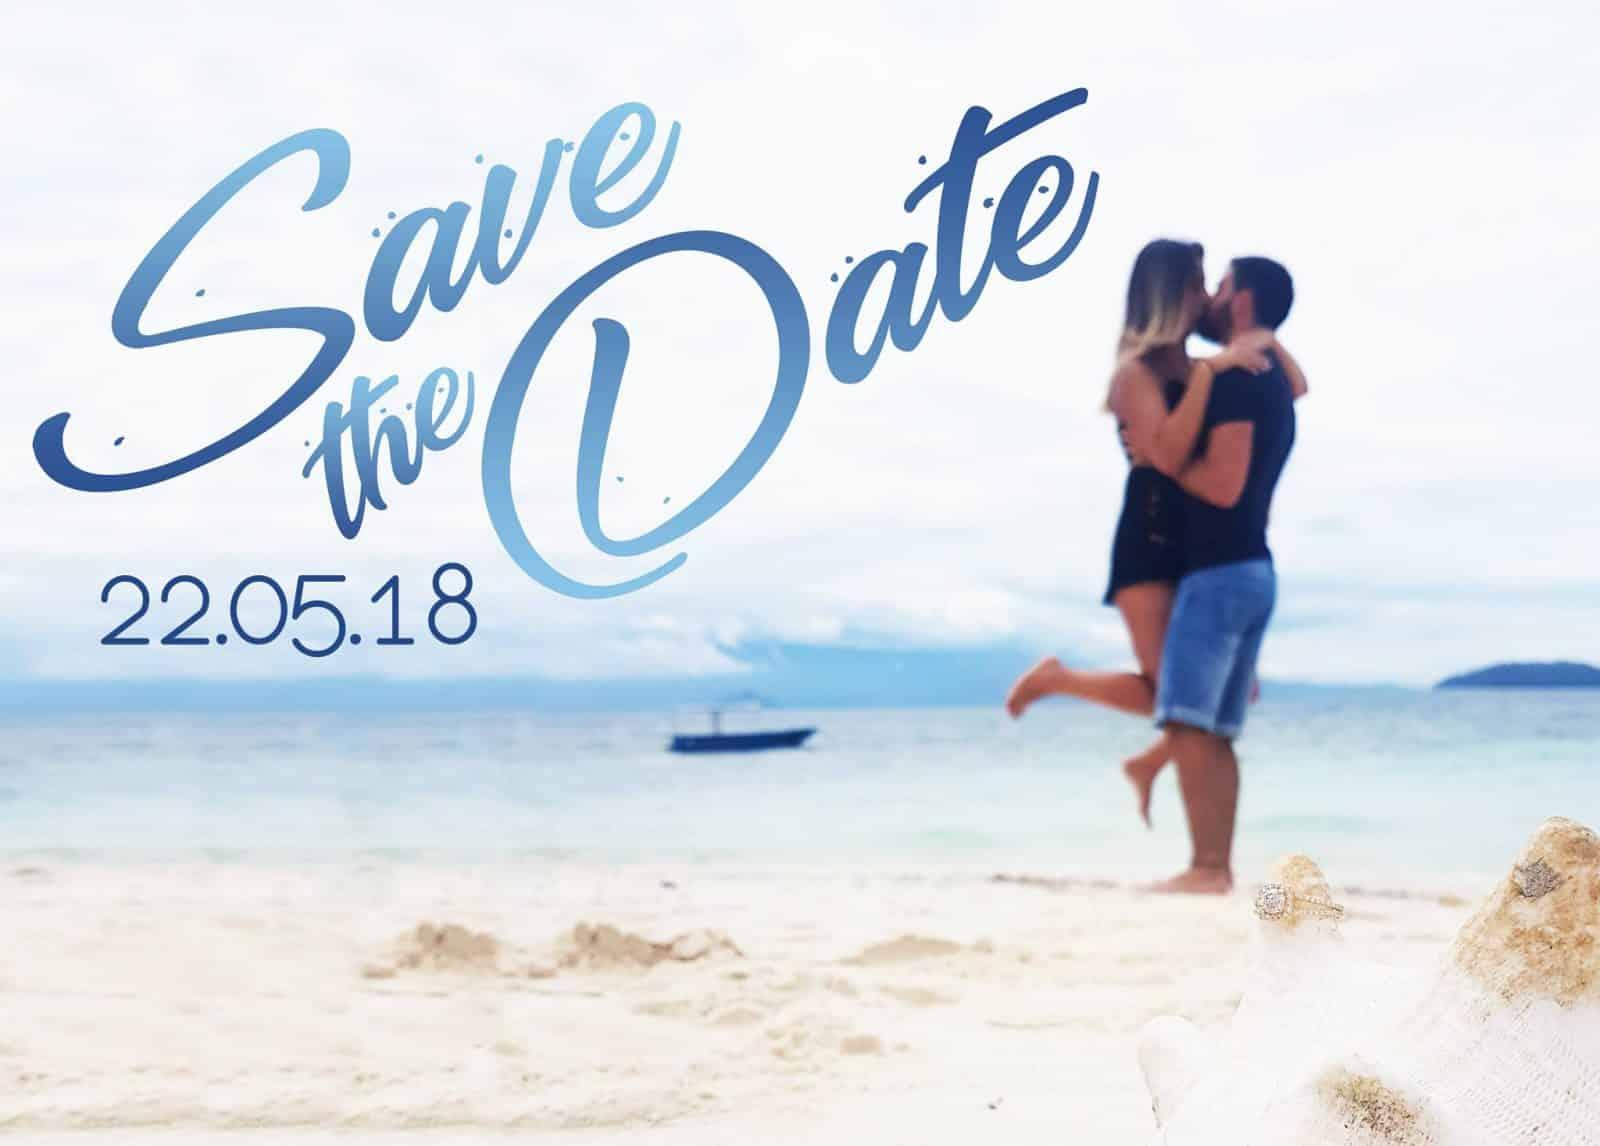 svae the date - גרייס